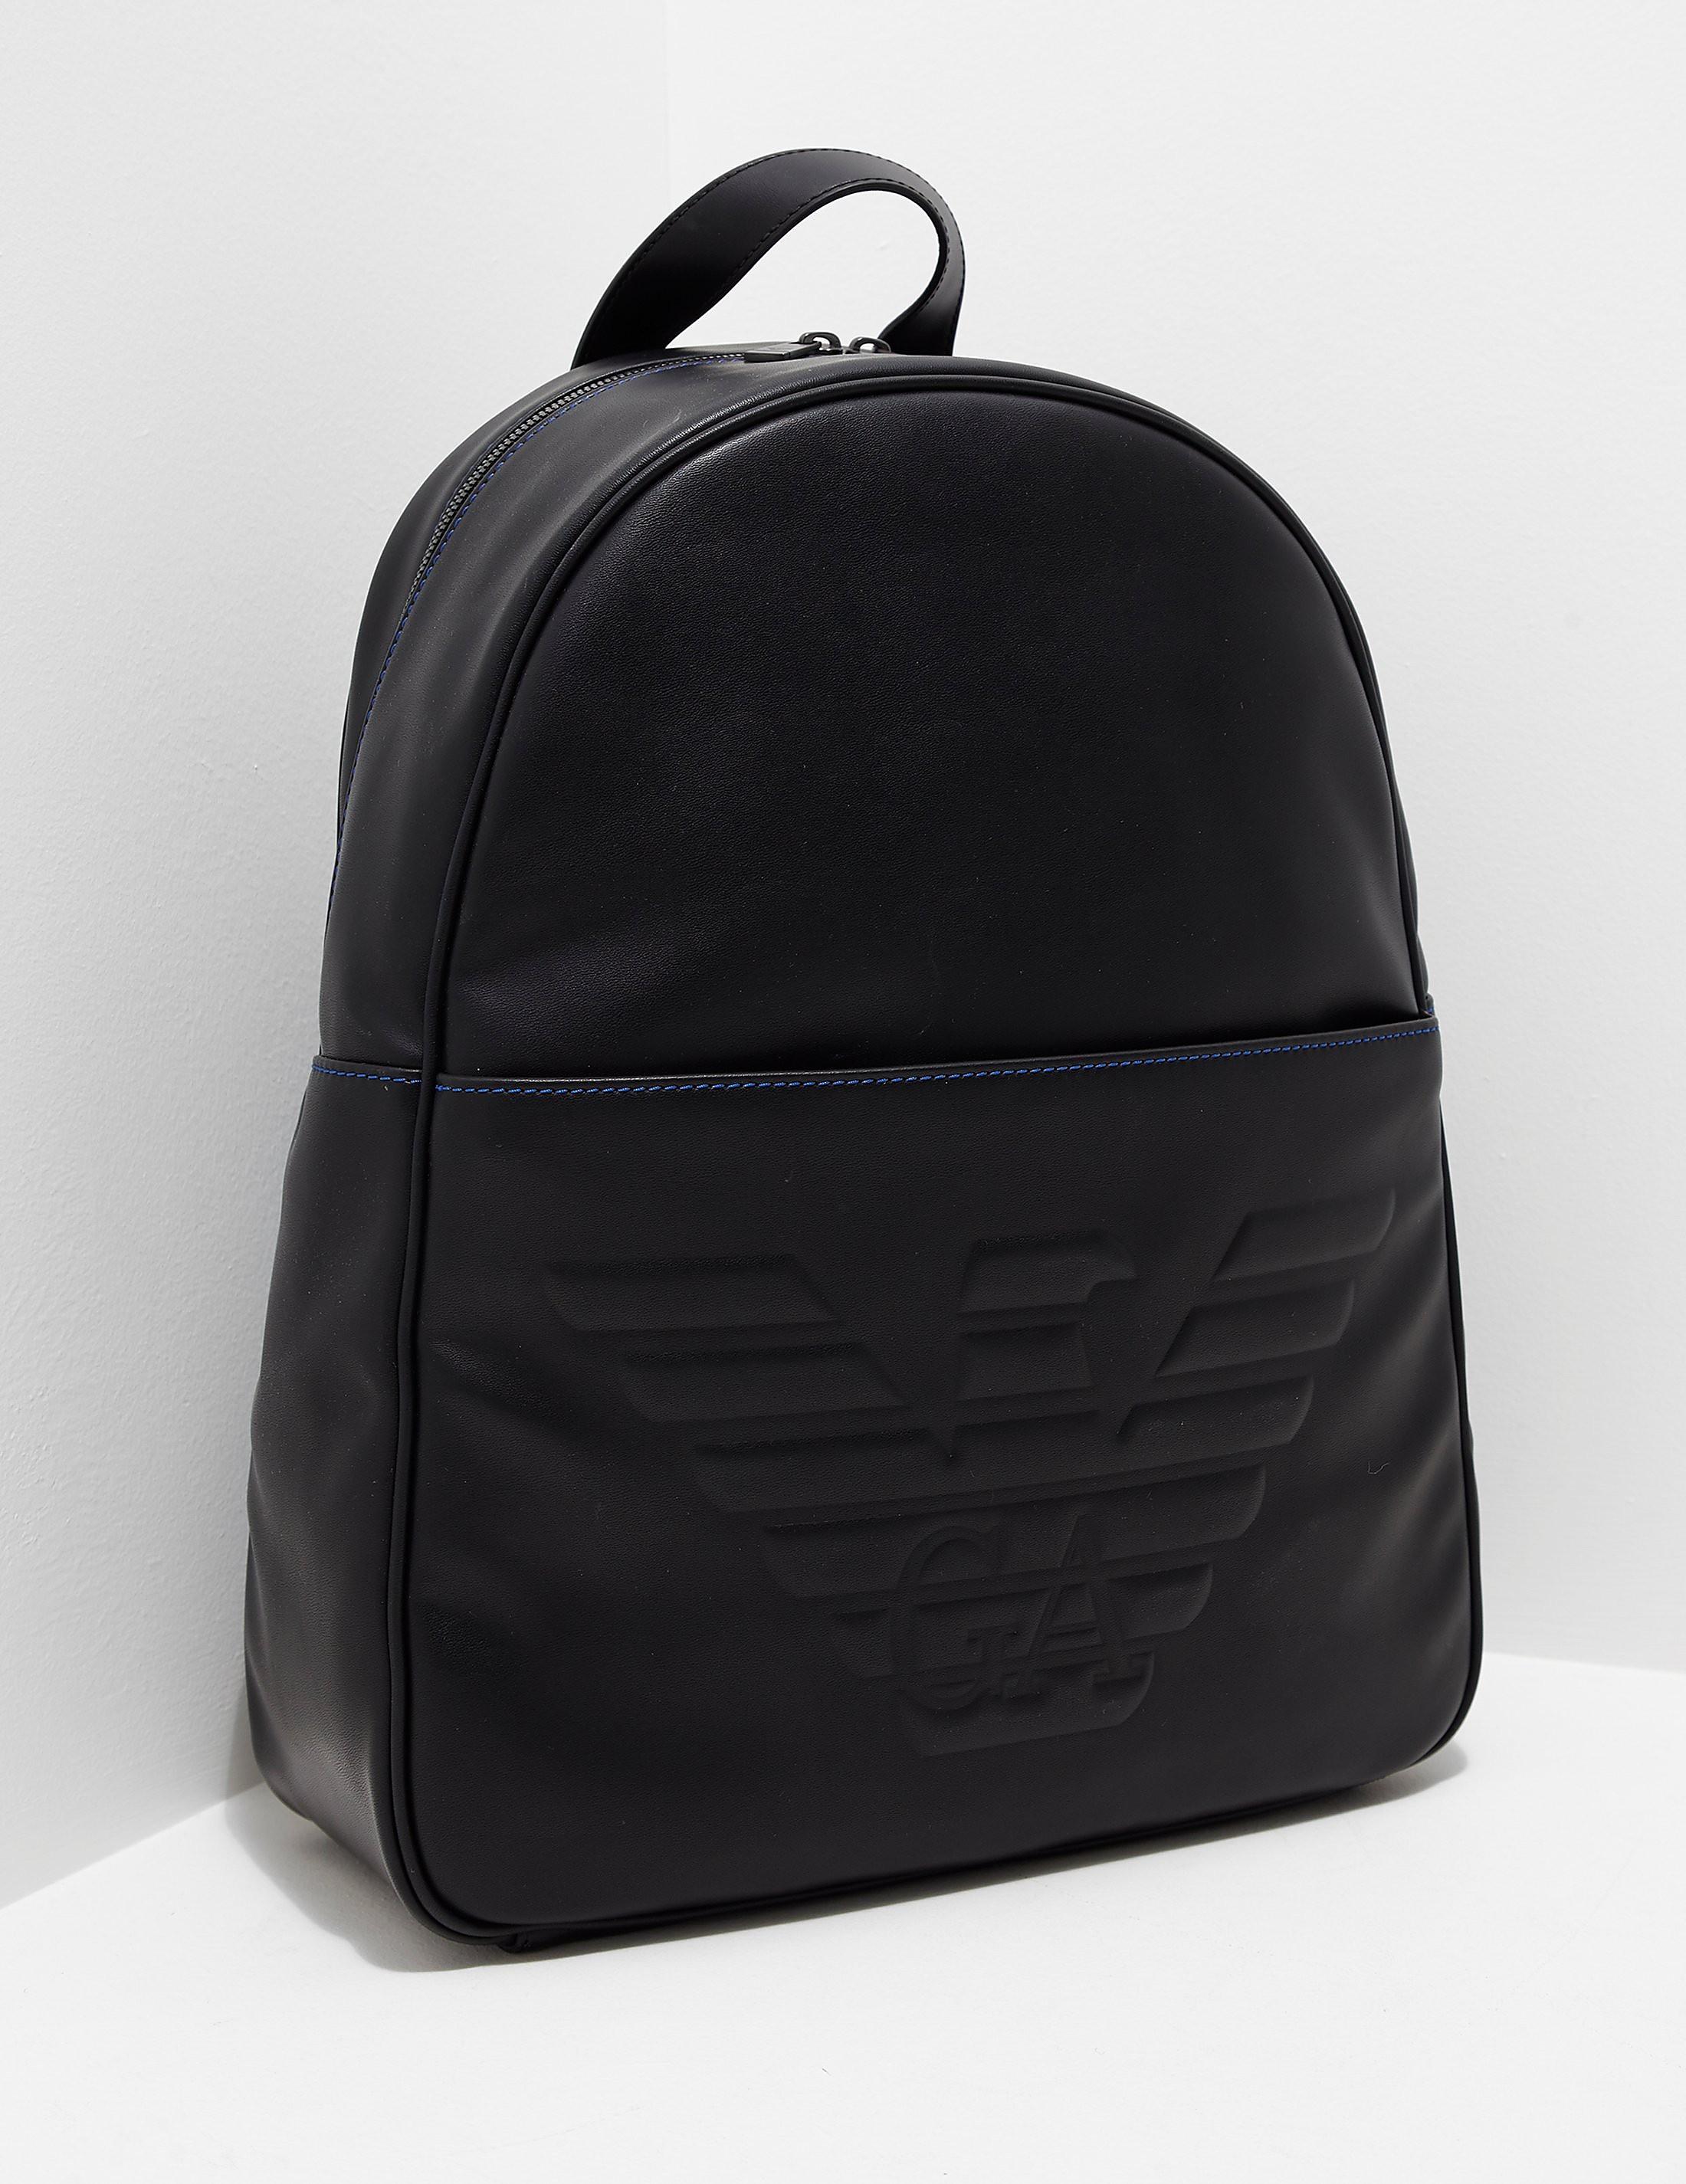 Emporio Armani Eagle Backpack